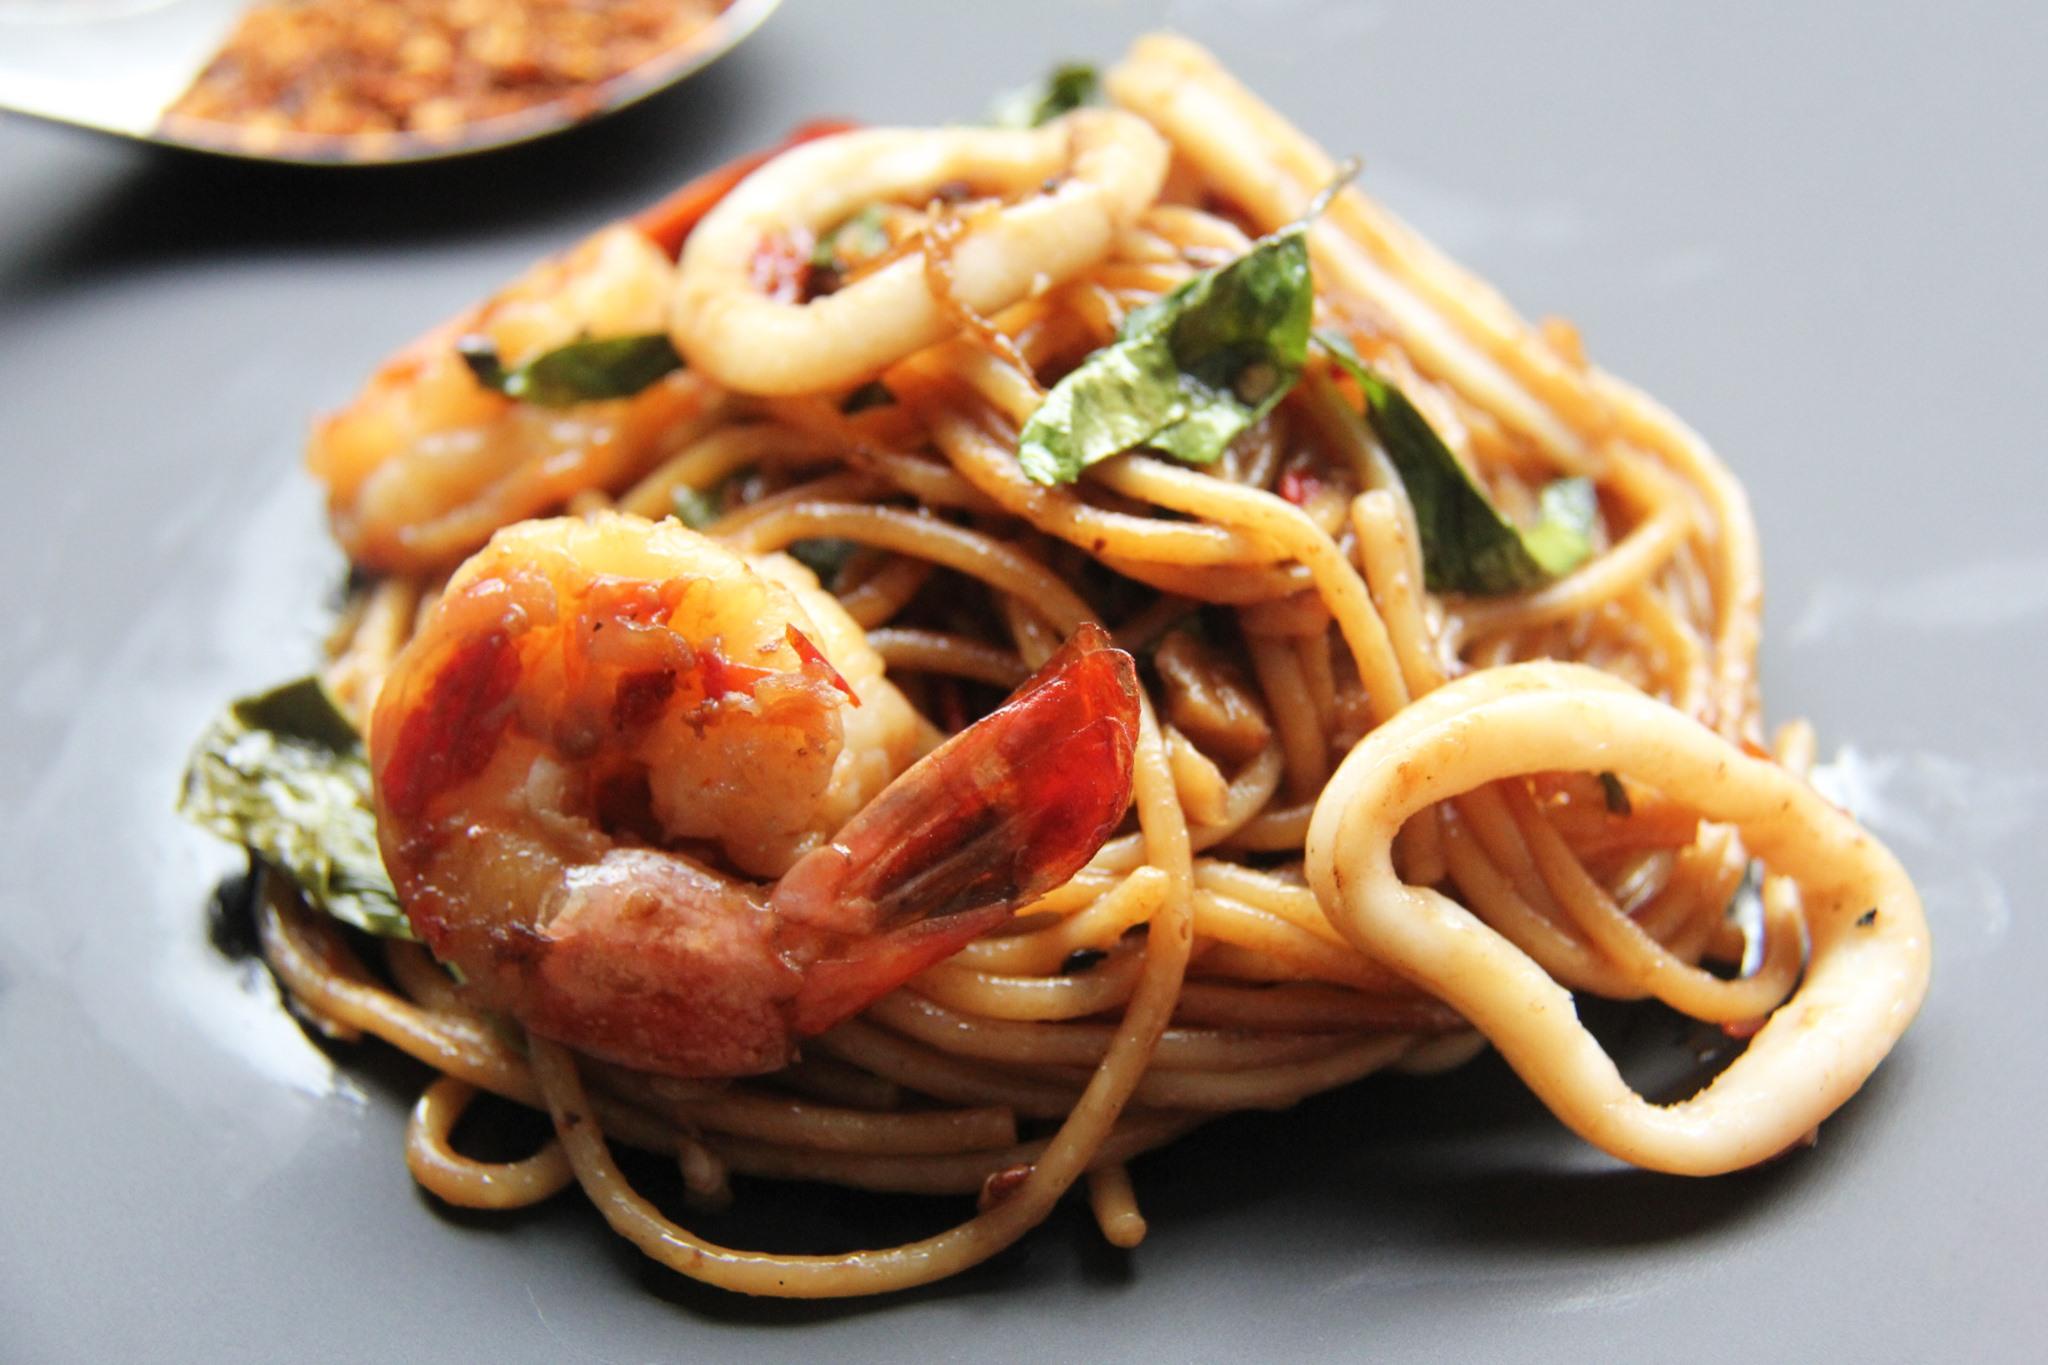 Signature Spicy Thai Spaghetti/Dry Green Curry Spaghetti + 1 Side